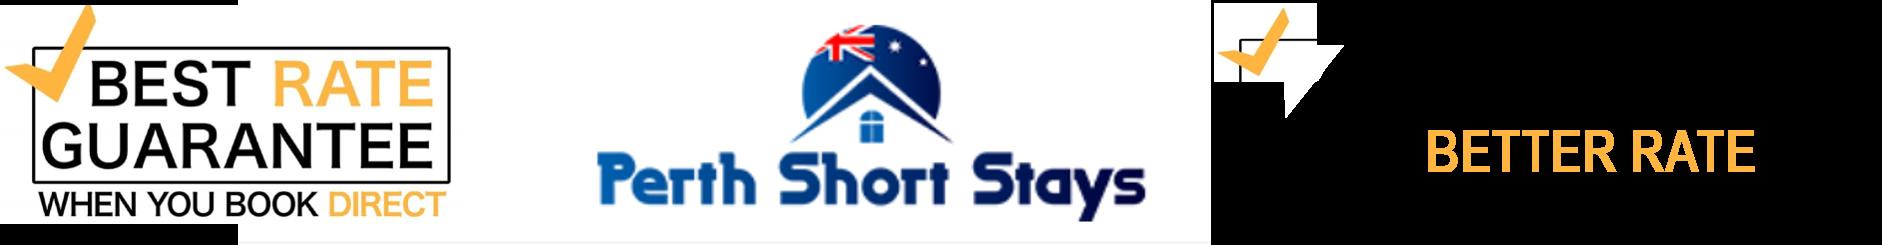 Perth Short Stays